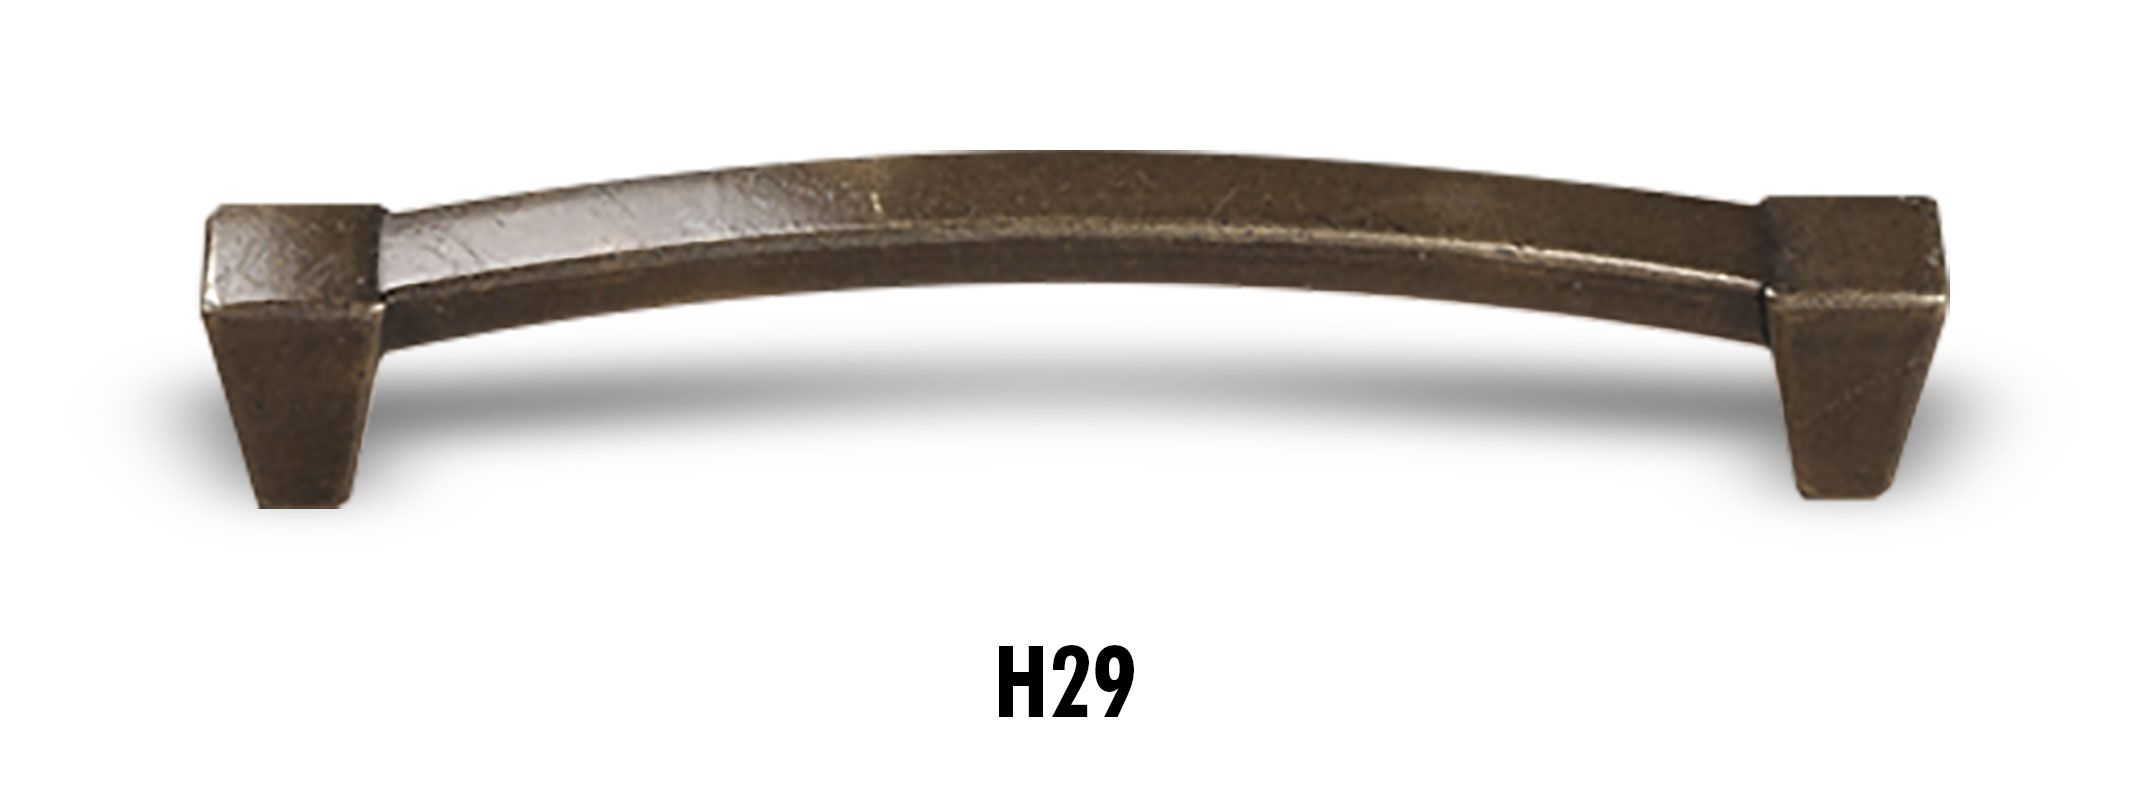 H29 Antique Brass Bar Handle